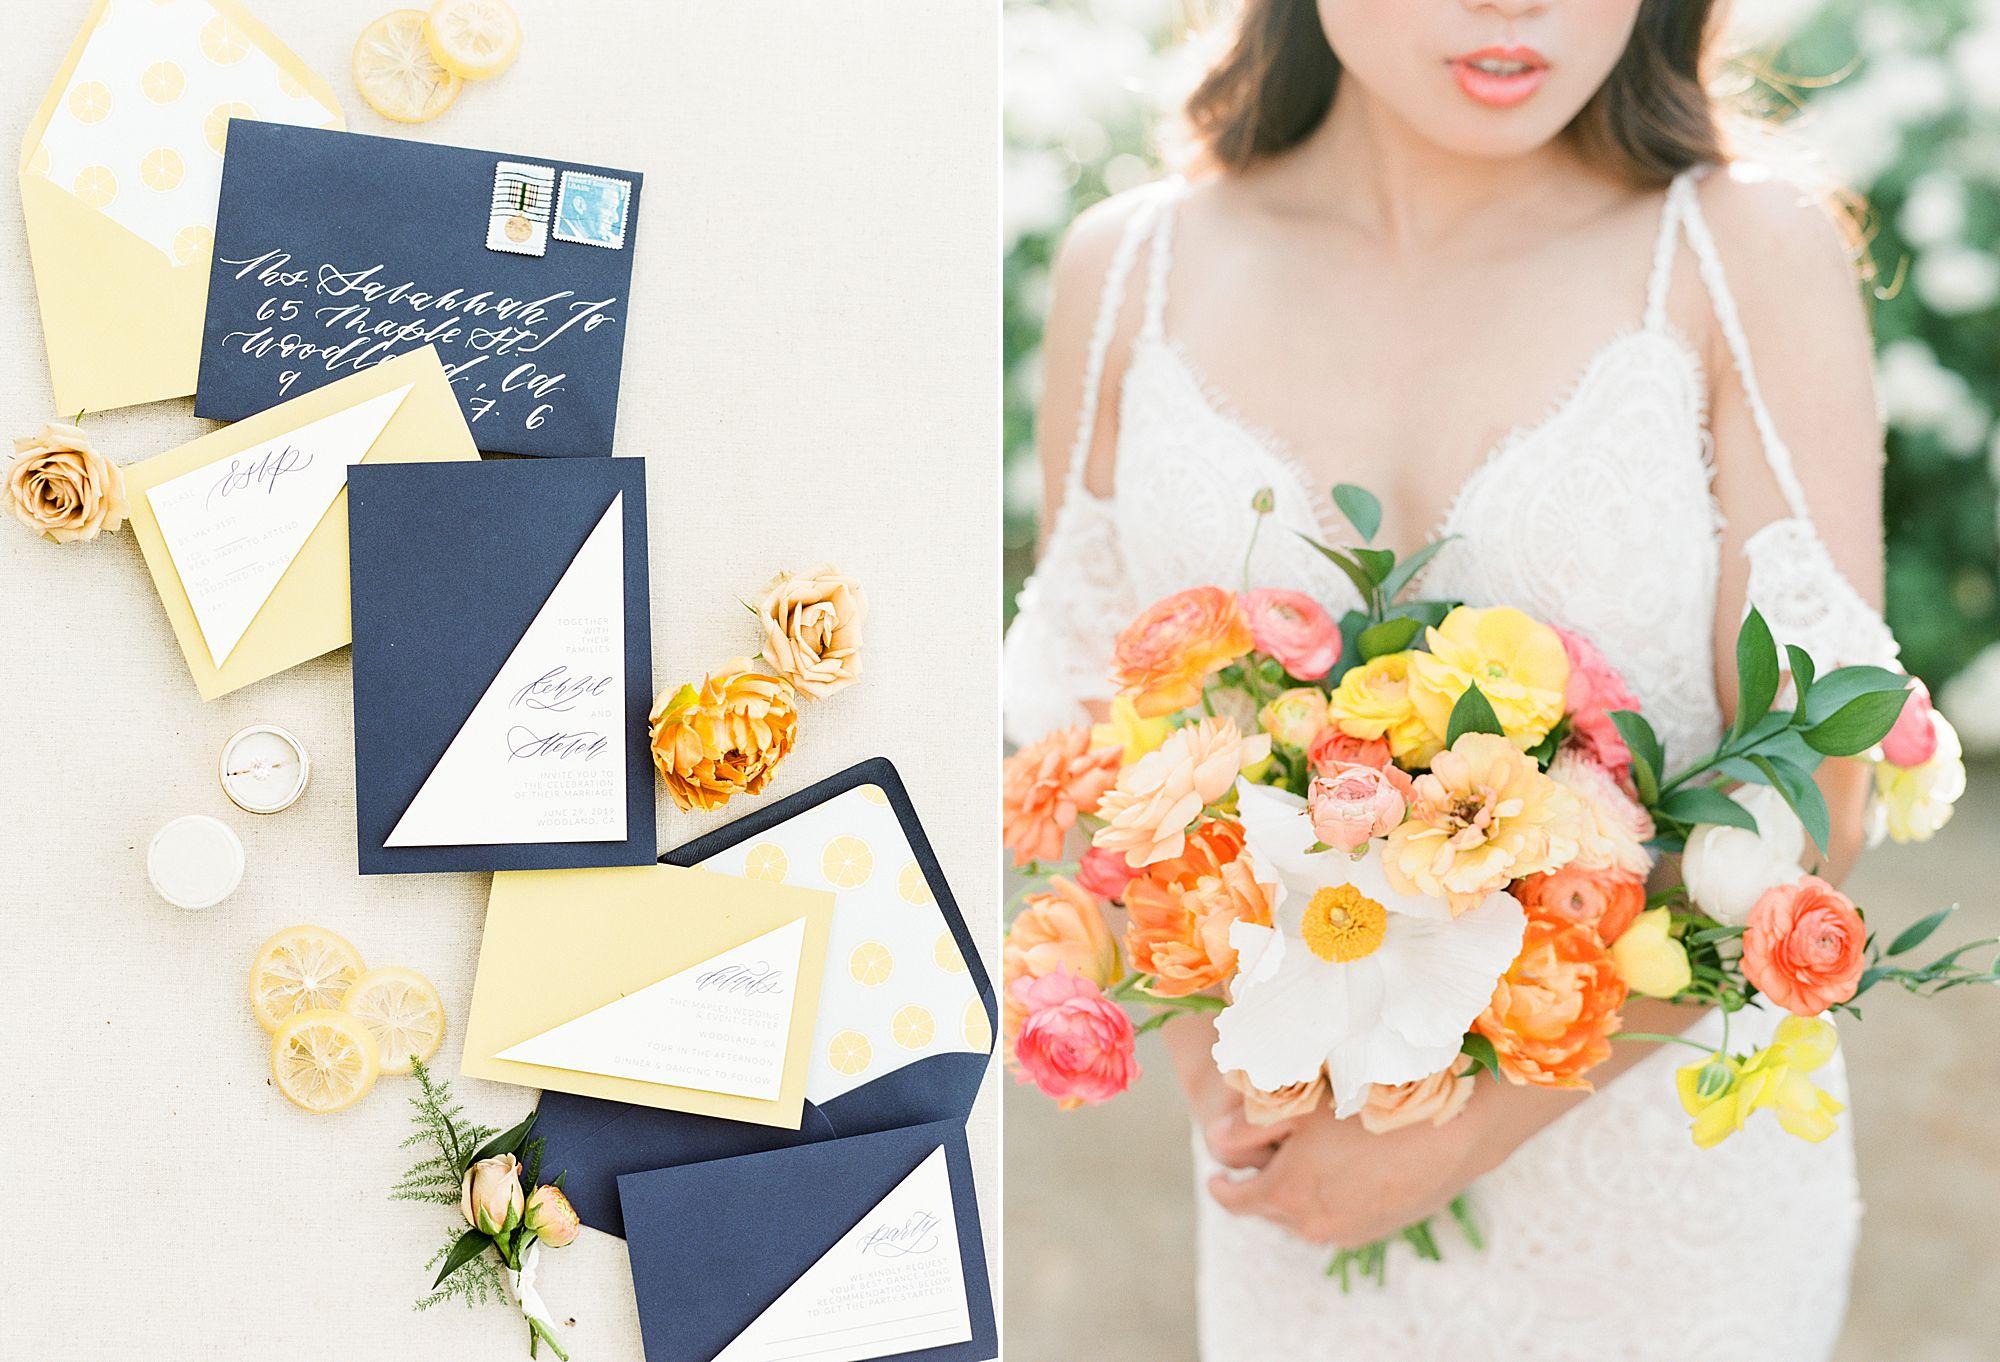 Italian Wedding Inspiration at The Maples Wedding & Event Center - Featured on Wedding Chicks - Ashley Baumgartner - Sacramento Wedding Phtoographer_0030.jpg